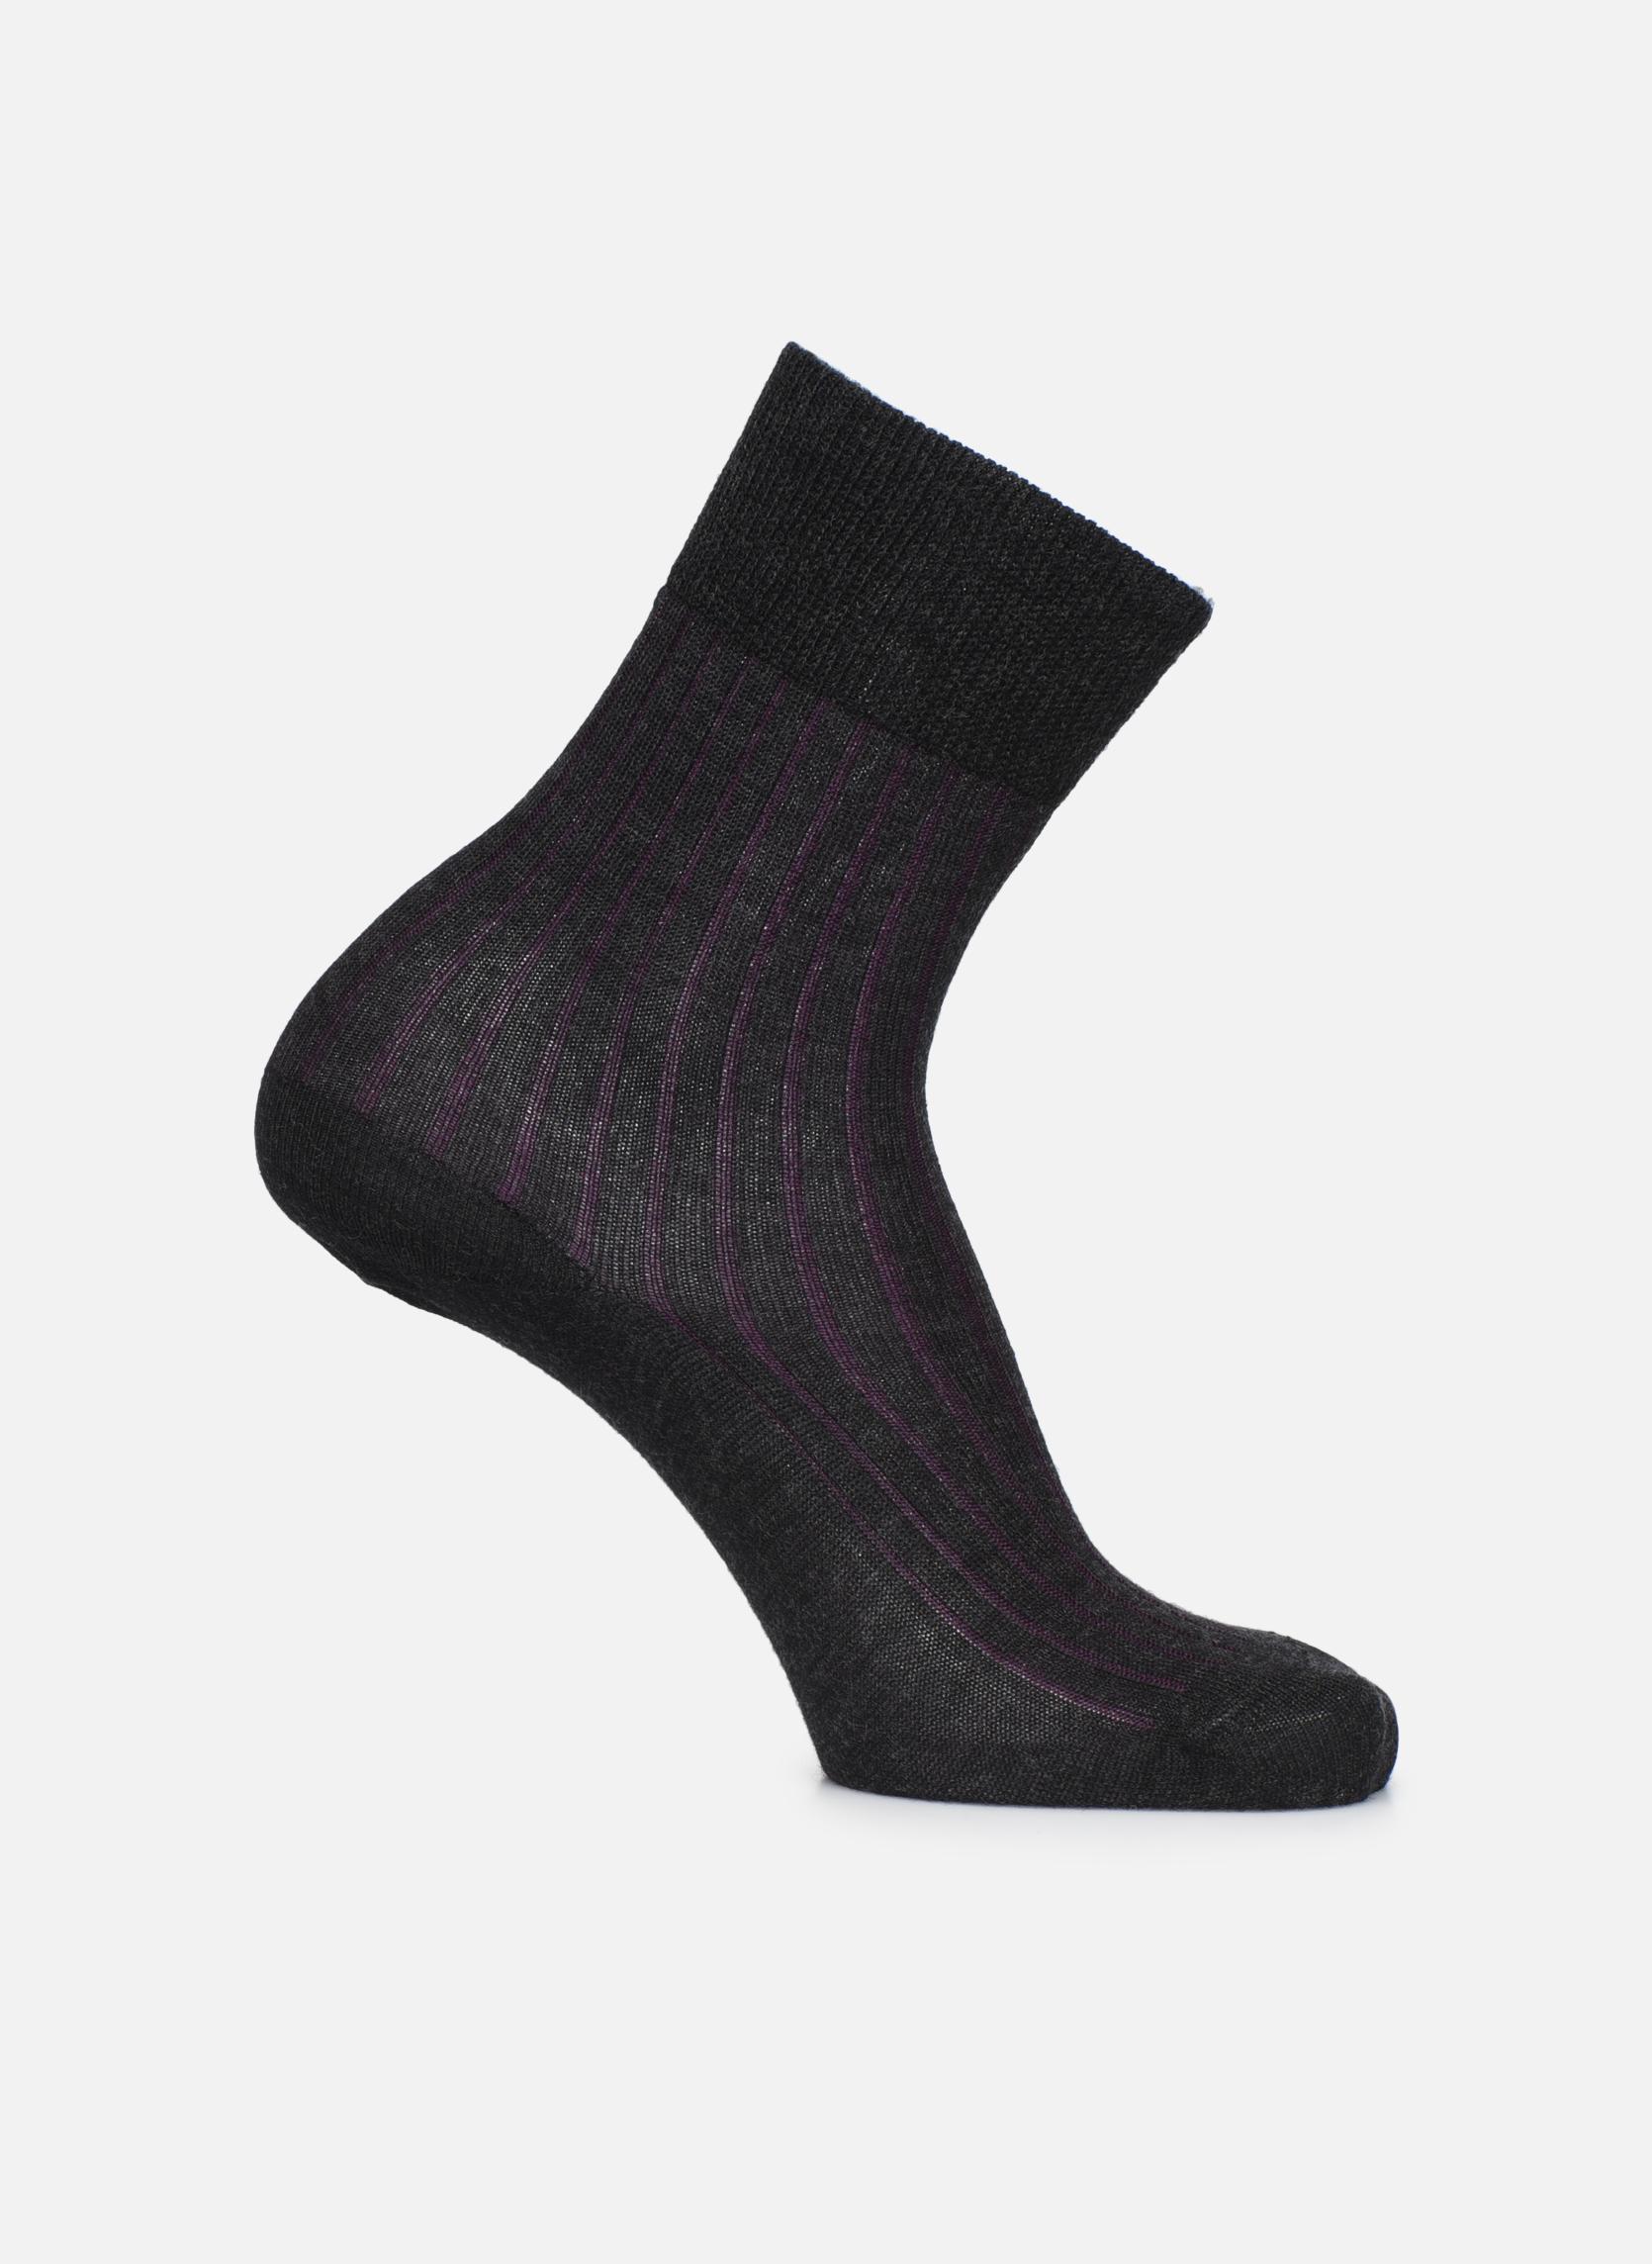 Socks SUBTILE 030 - gris / rouge